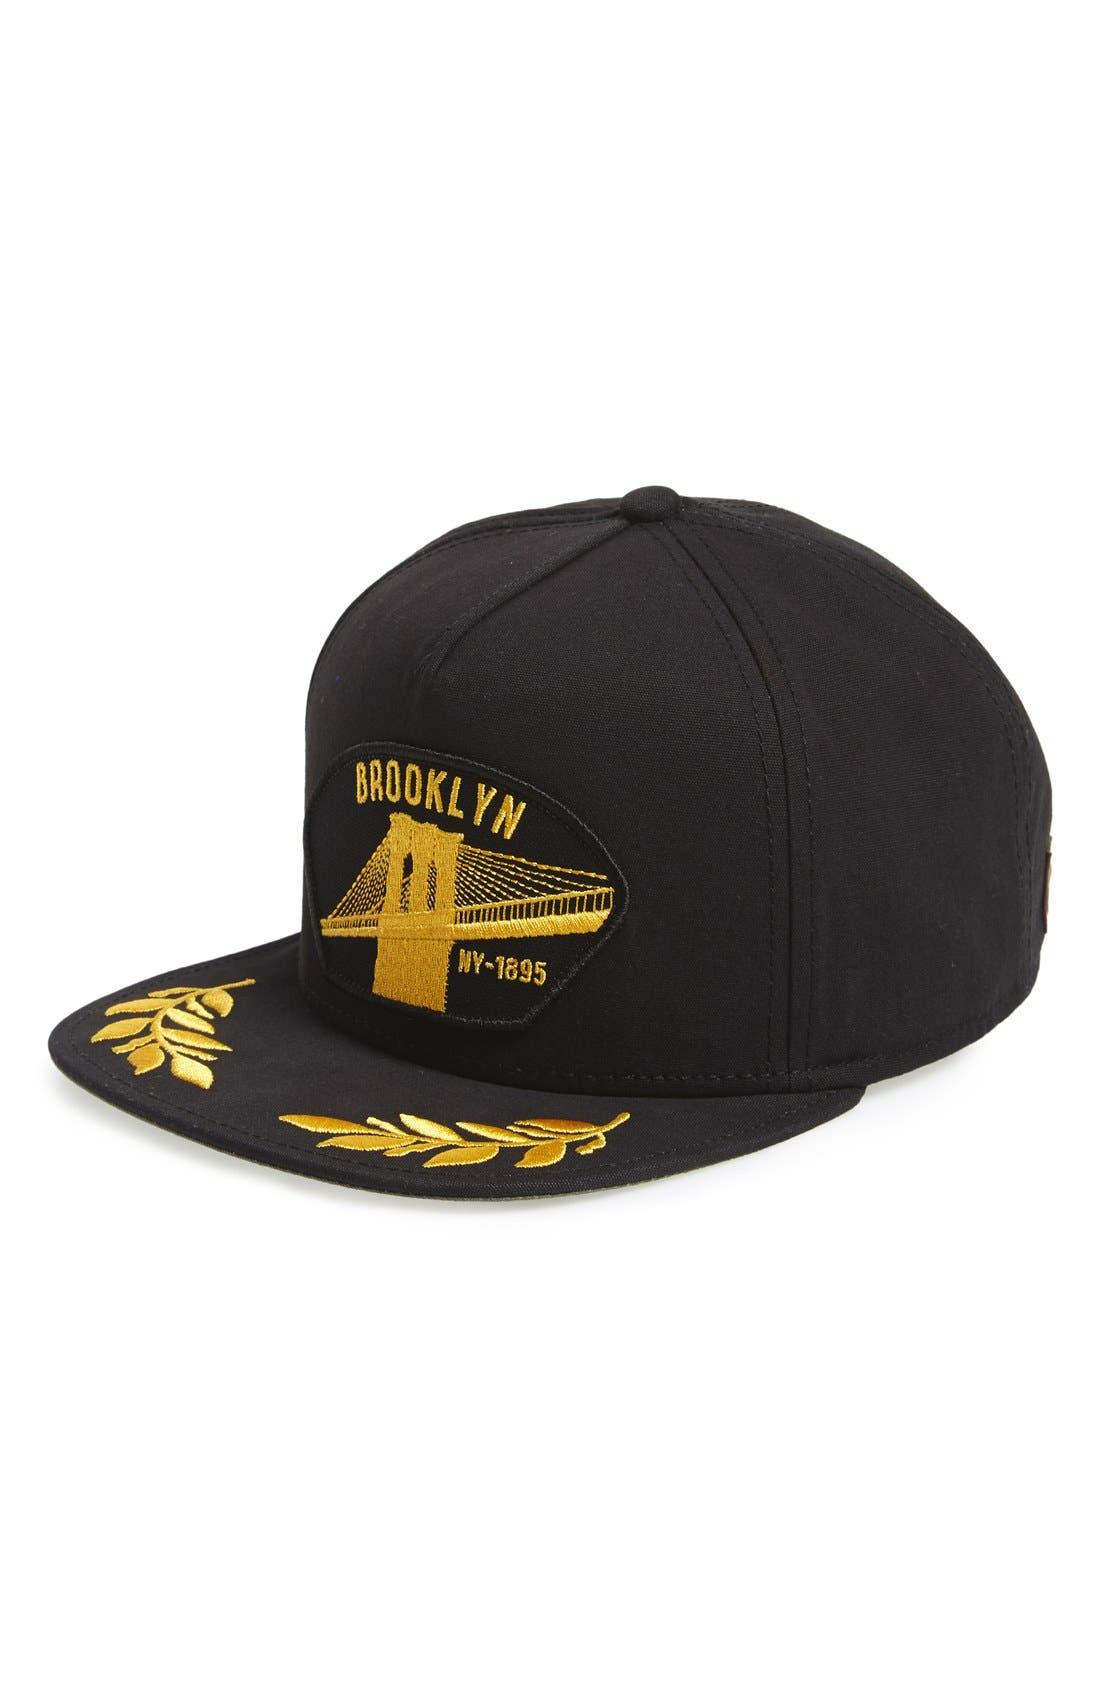 'Brooklyn Steel' Snapback Cap,                         Main,                         color, Black